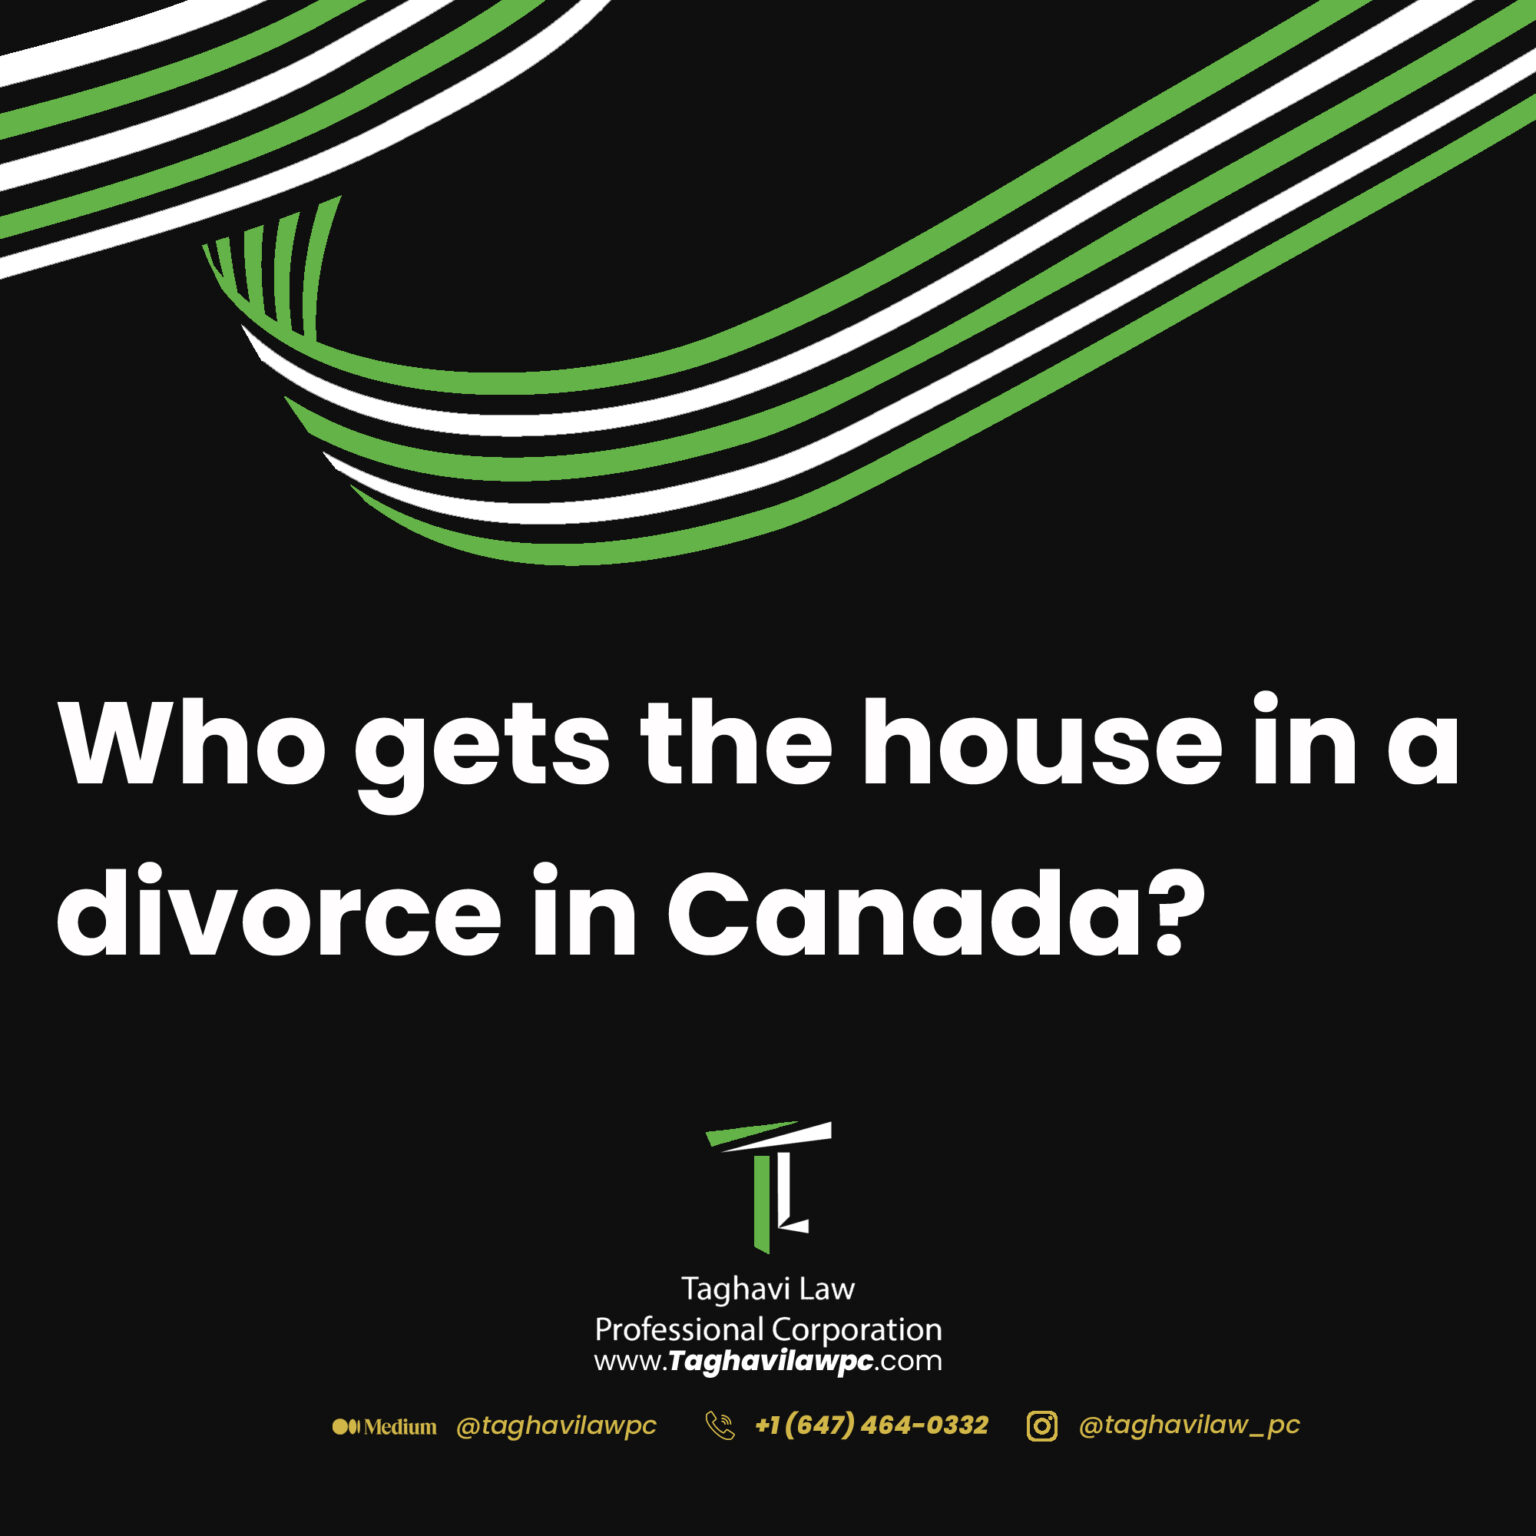 divorce in Canada